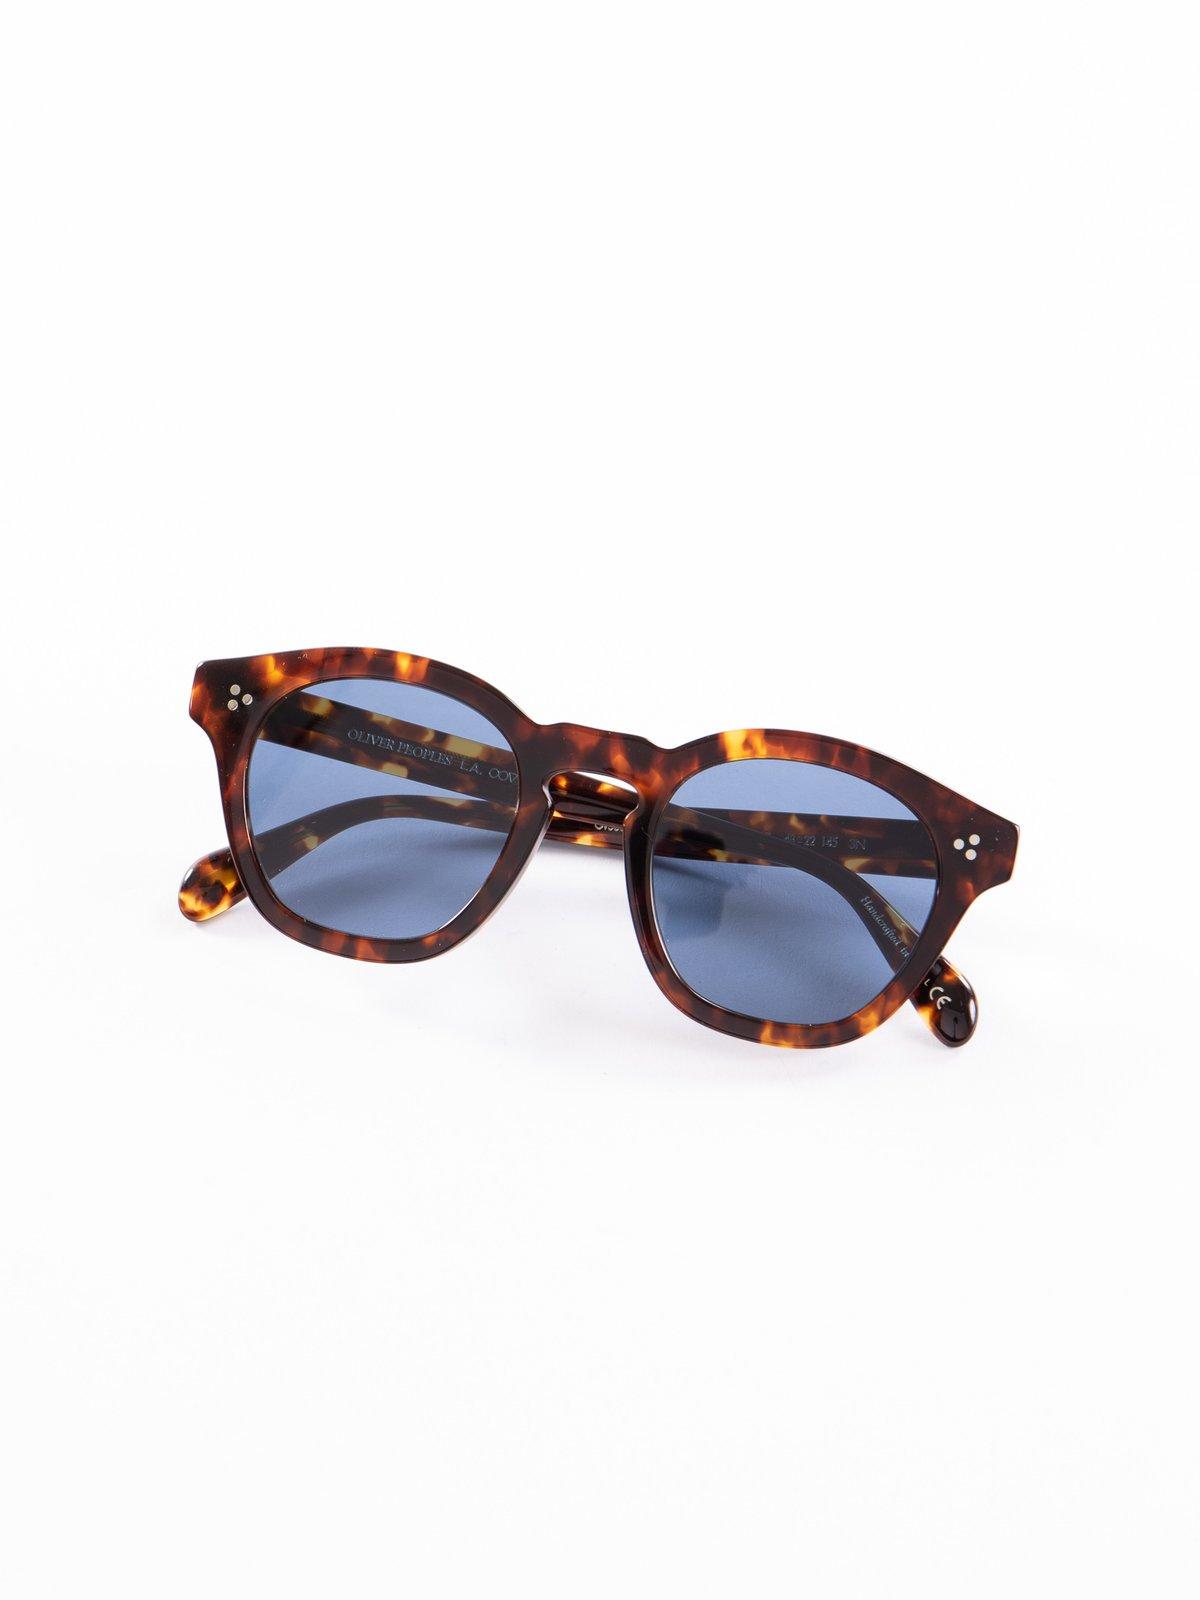 DM2/Dark Blue Boudreau LA Sunglasses - Image 1